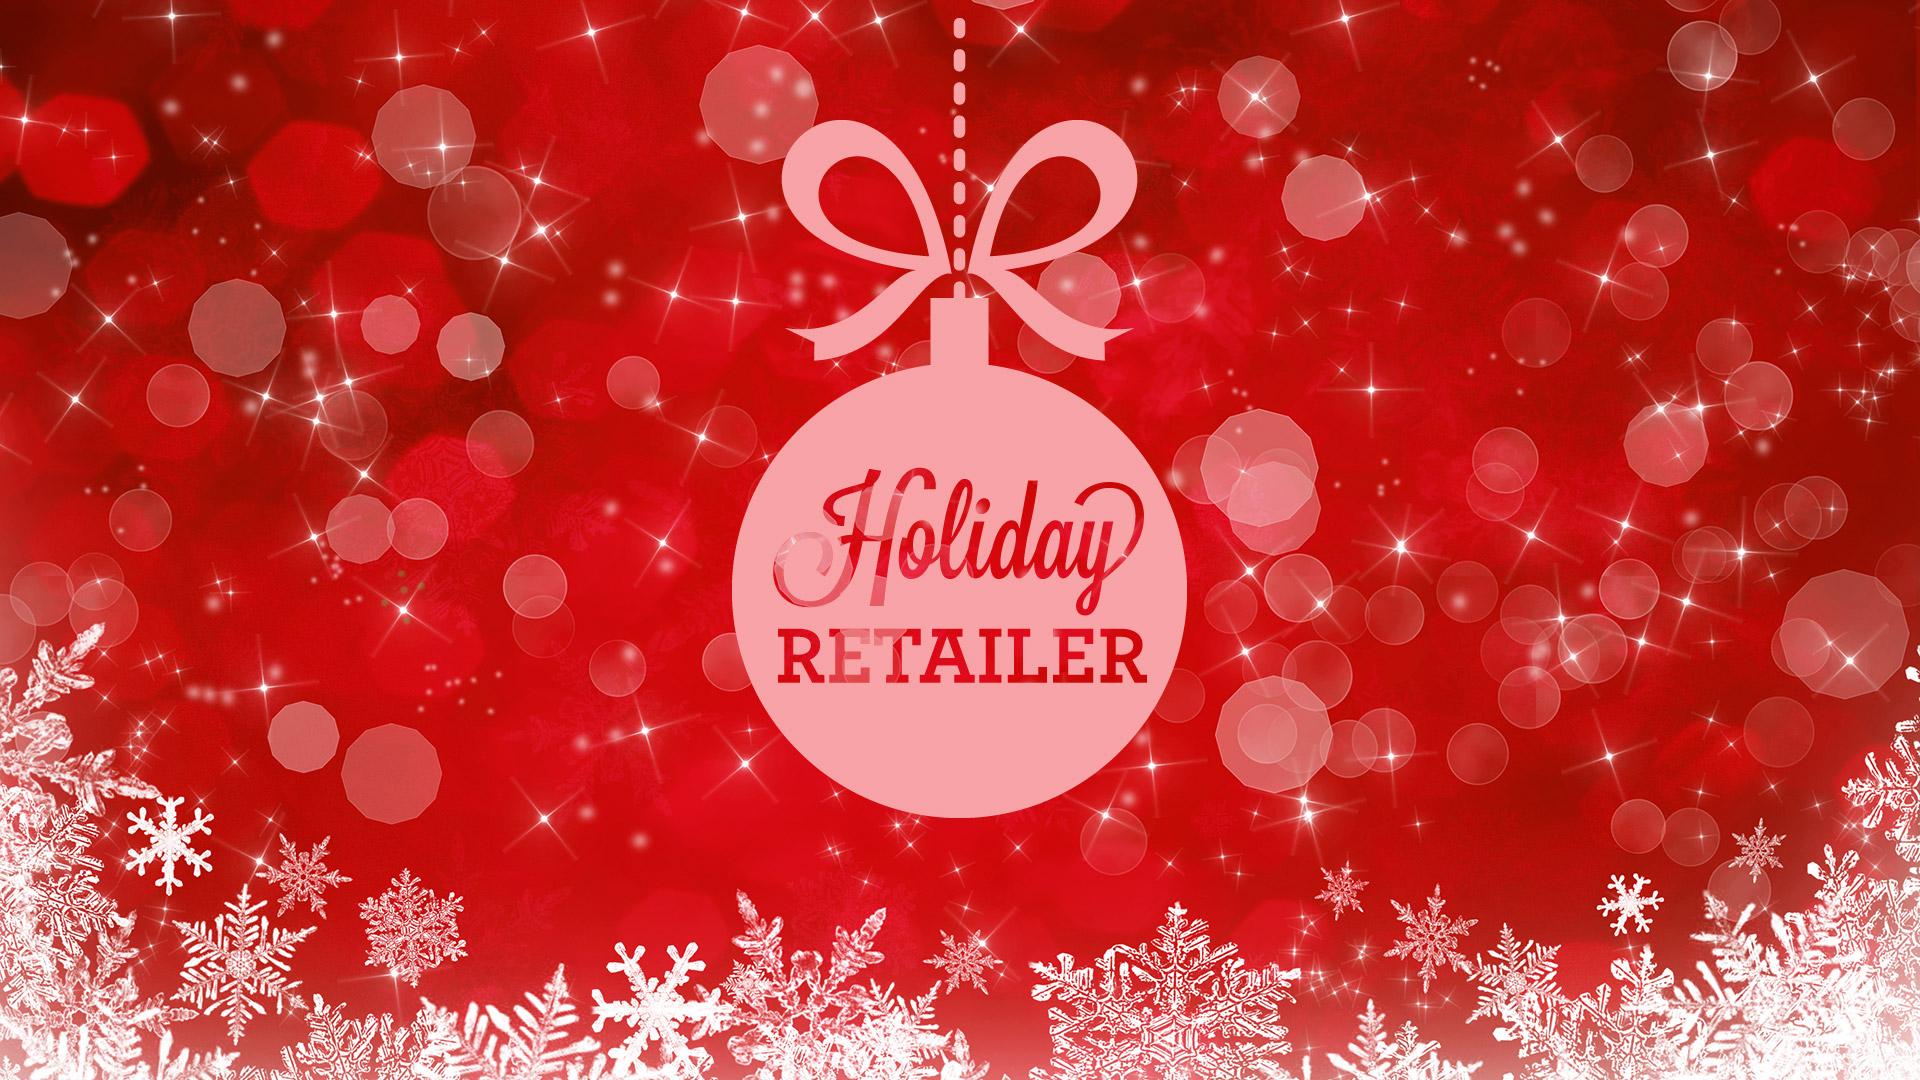 holiday-retailer2016f-fade-ss-1920